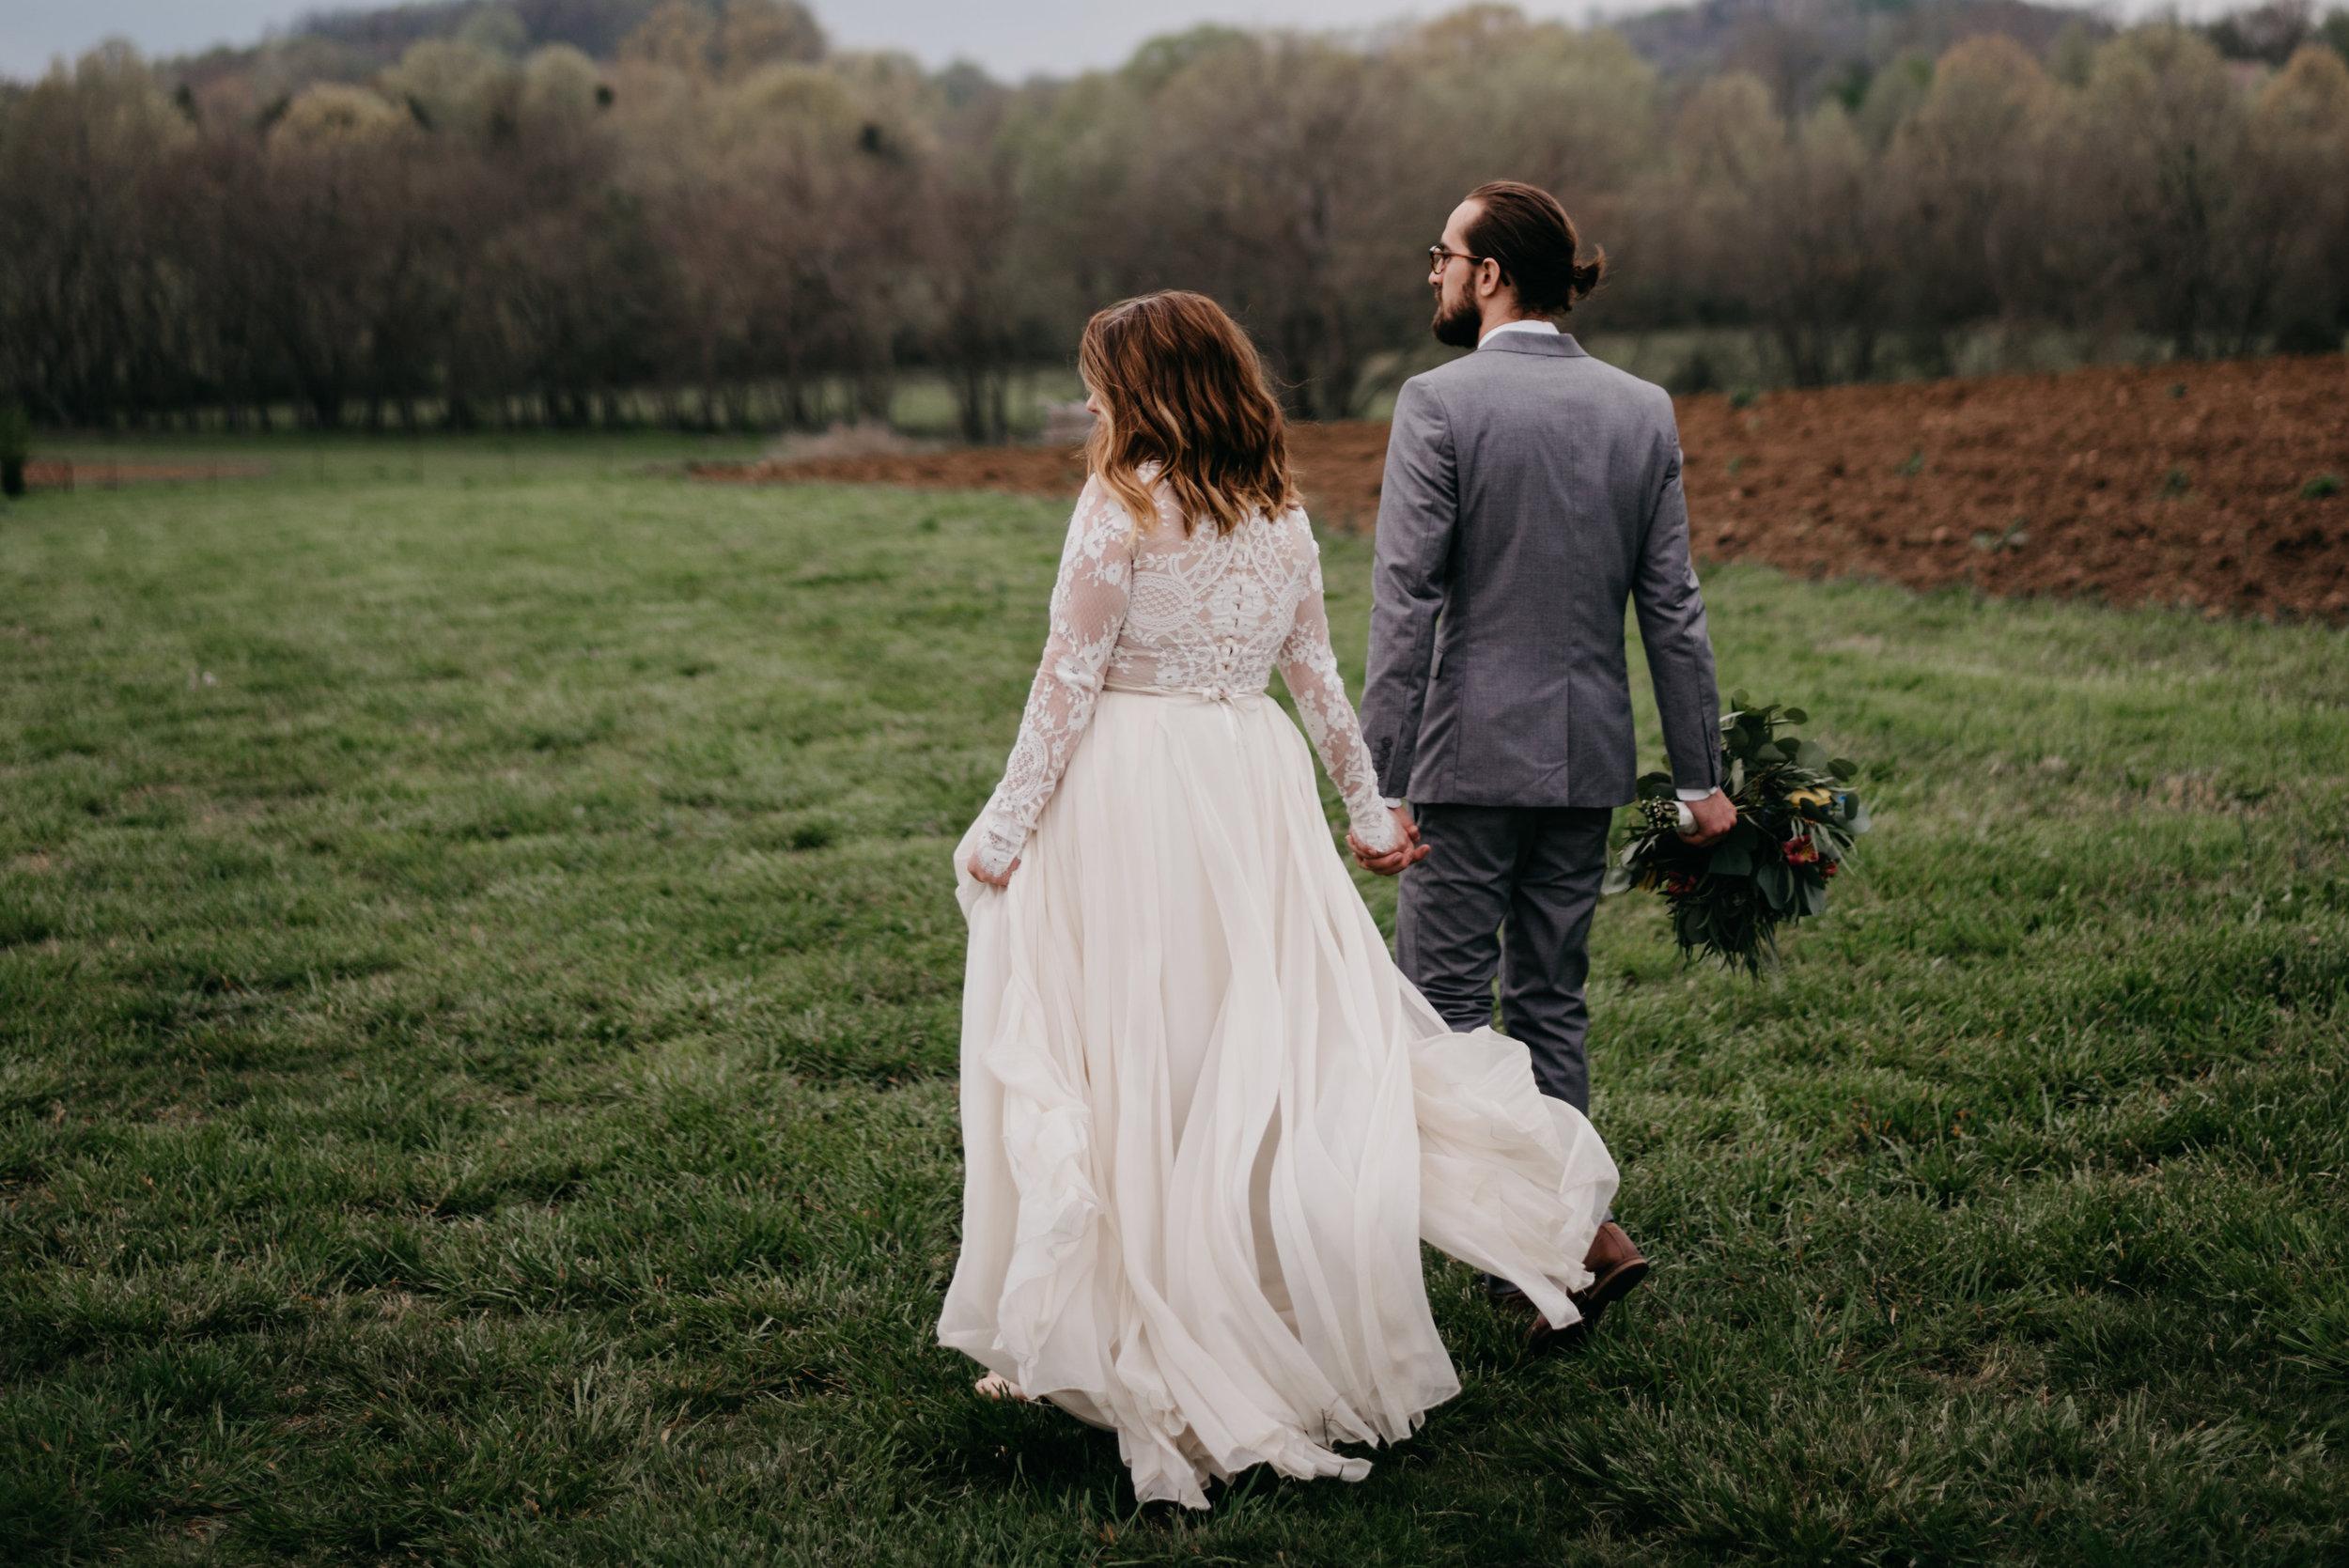 Allenbrooke-Farms-Nashville-Wedding-Photographers 27.jpg